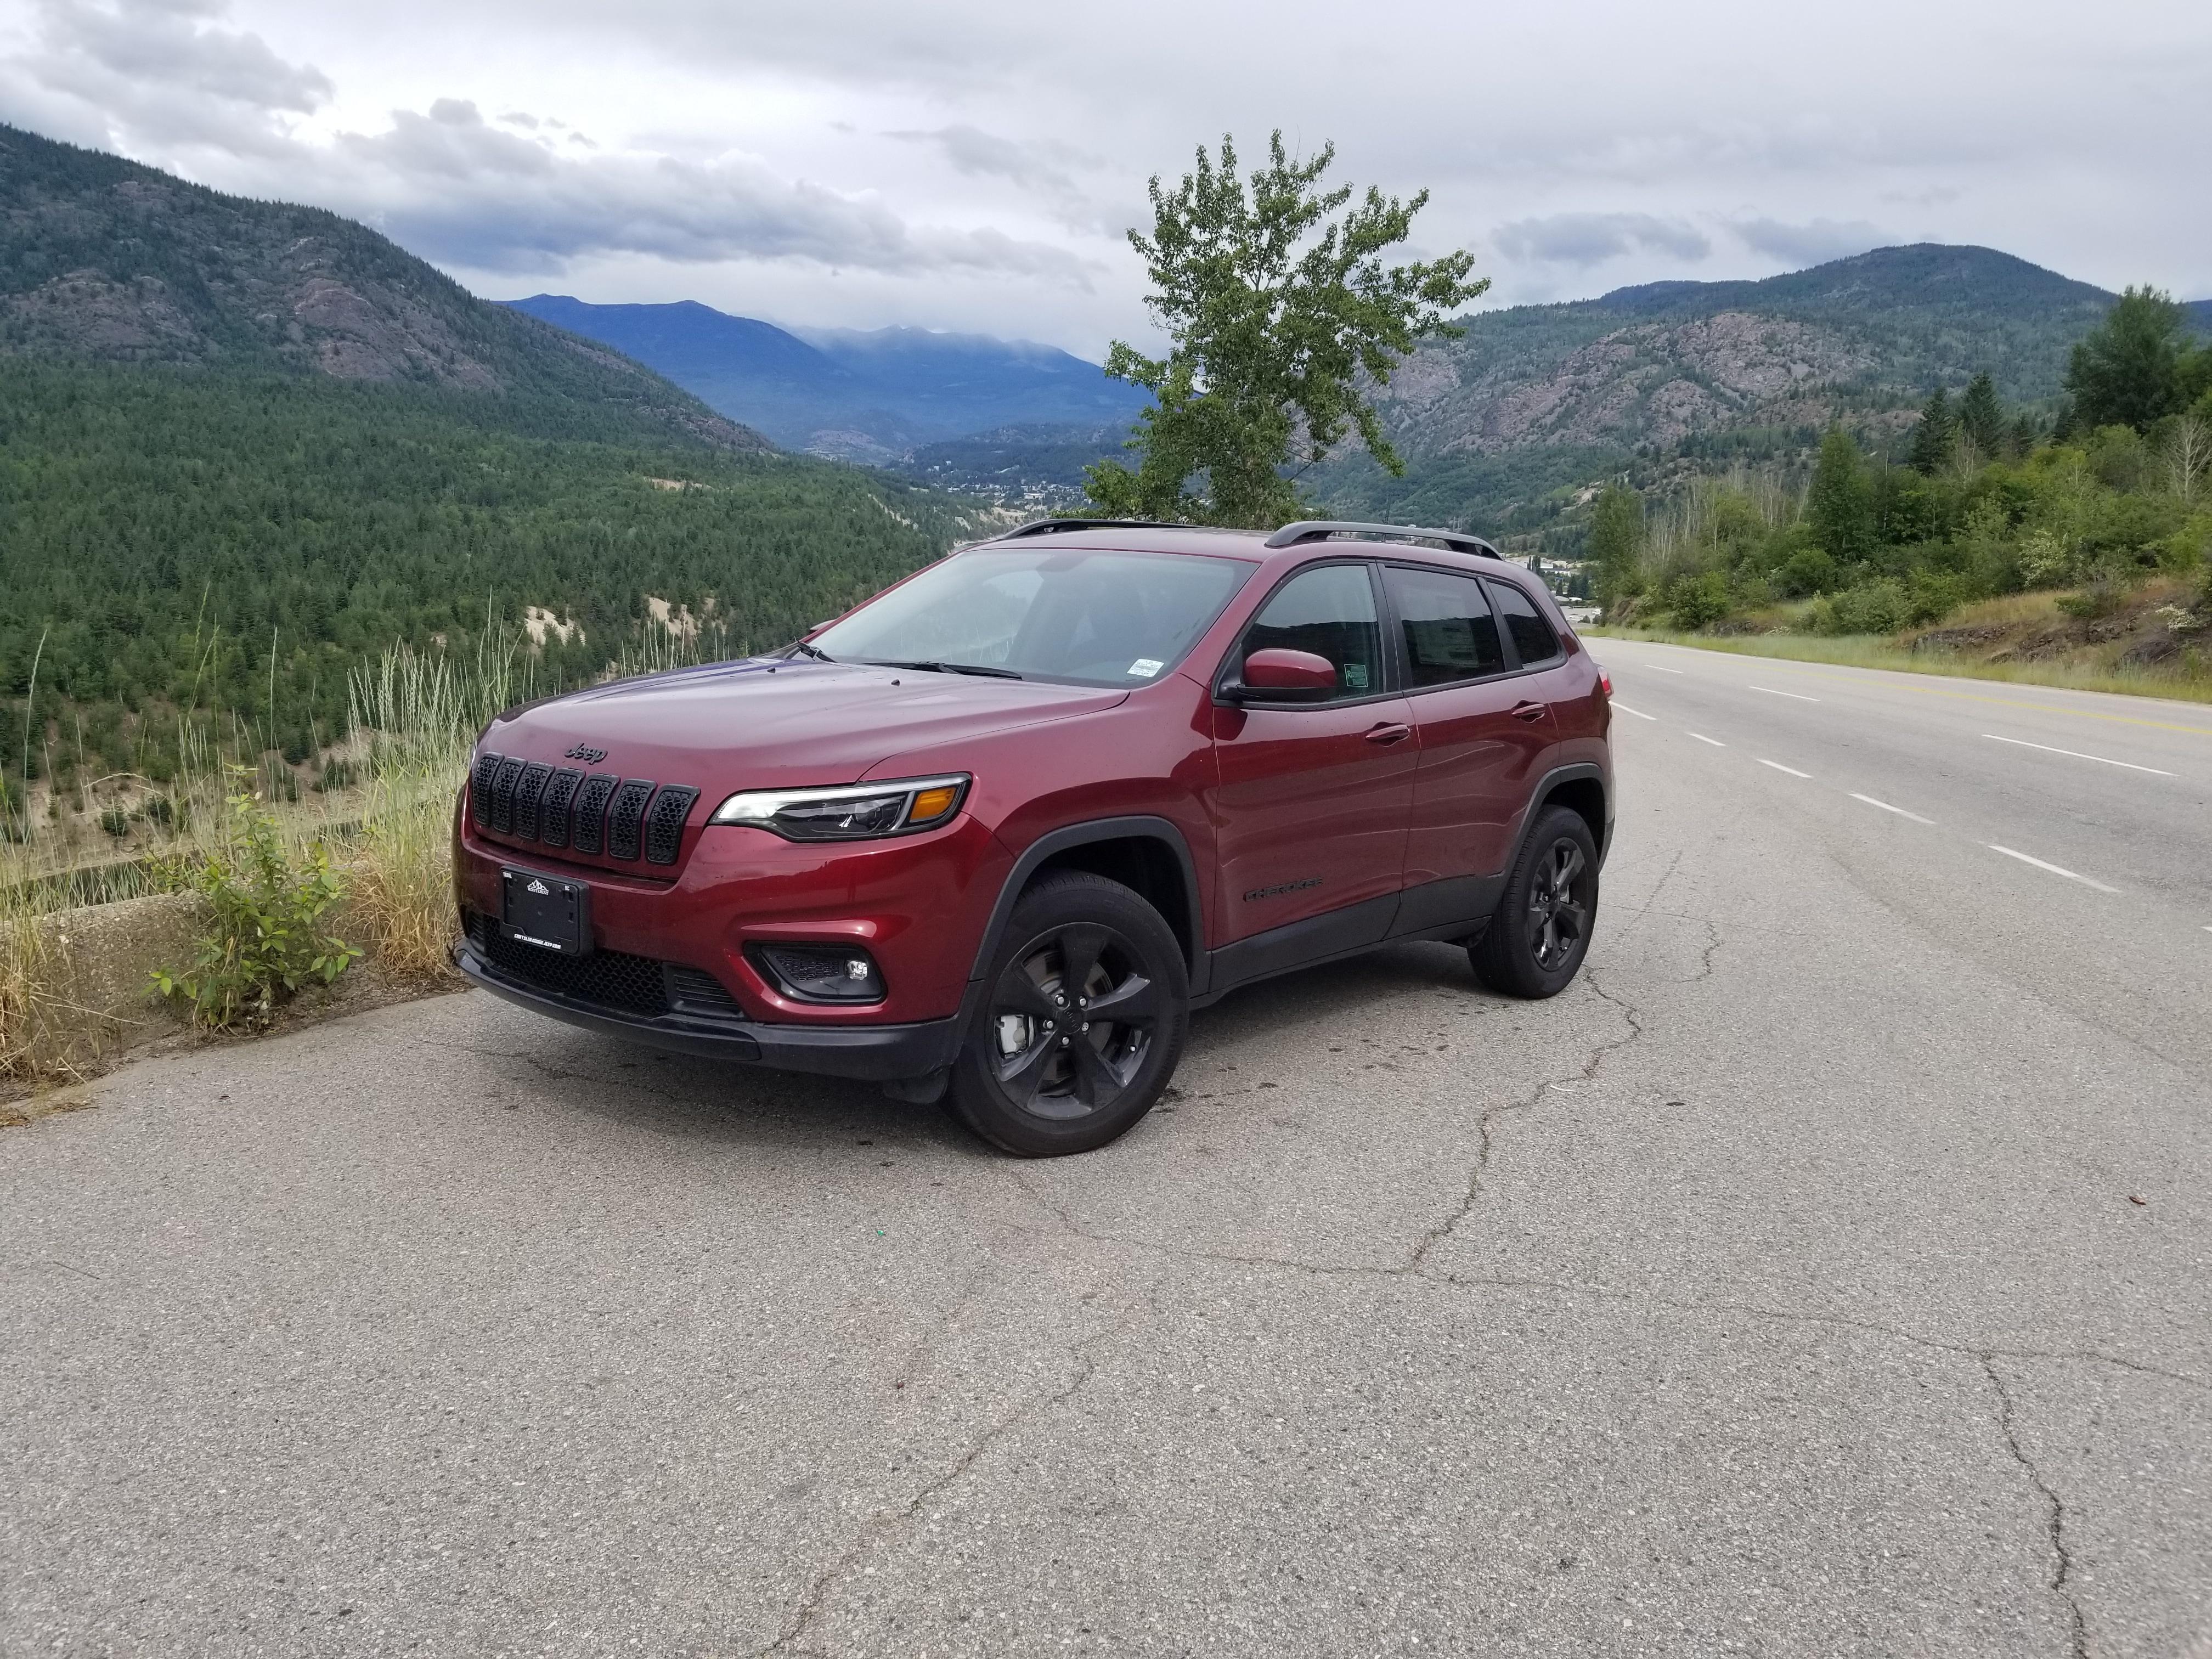 2019 Jeep New Cherokee North 4x4